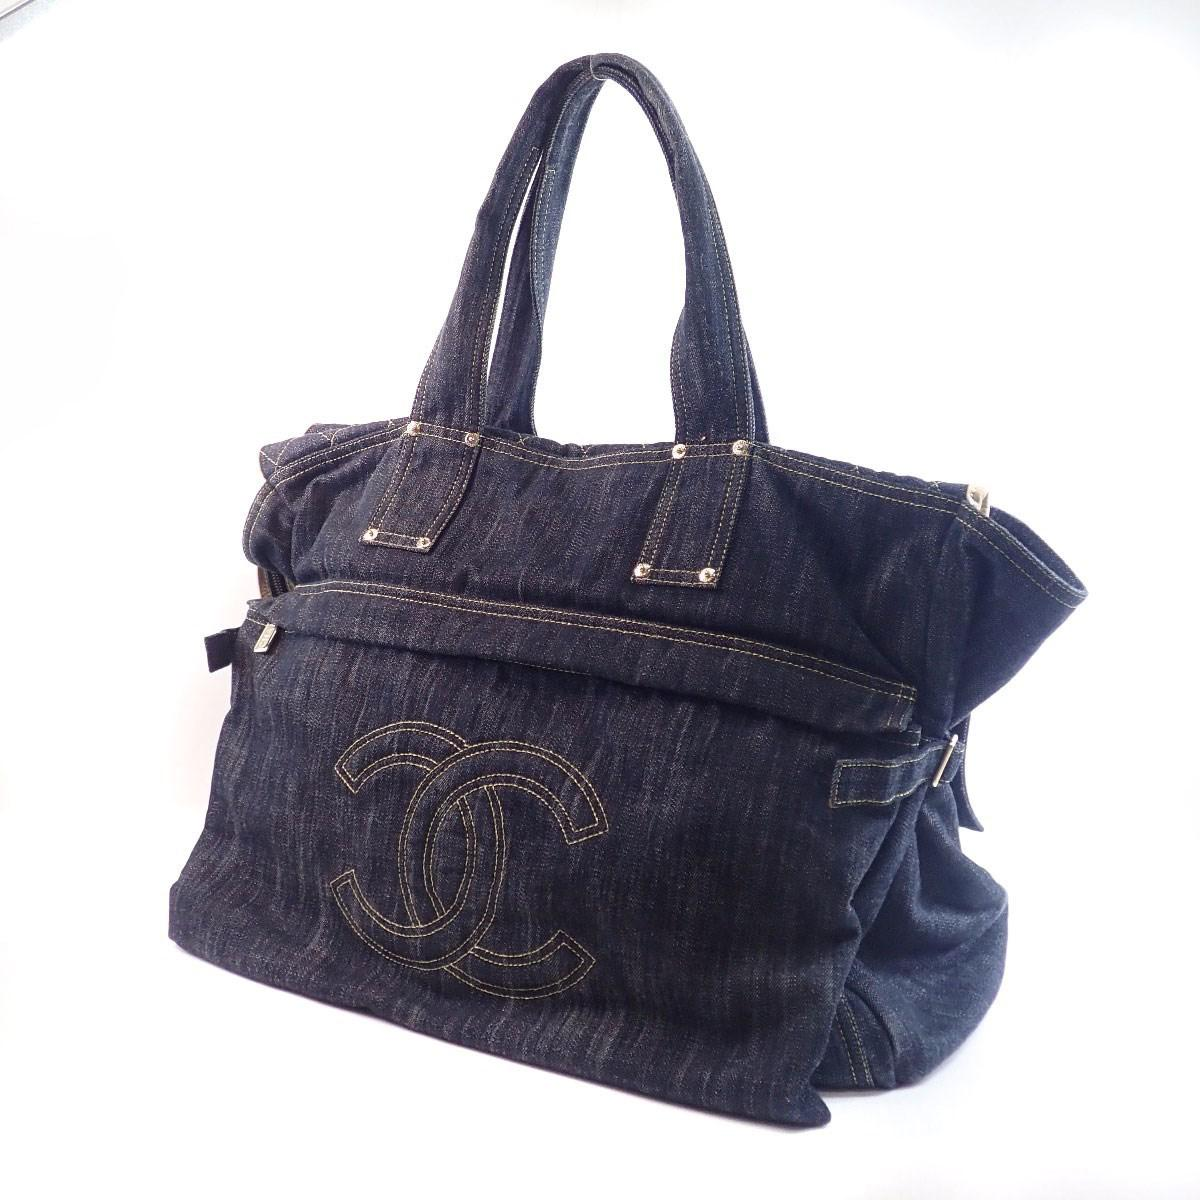 f91a669c91f Lyst - Chanel Denim Tote Bag Coco Mark in Blue